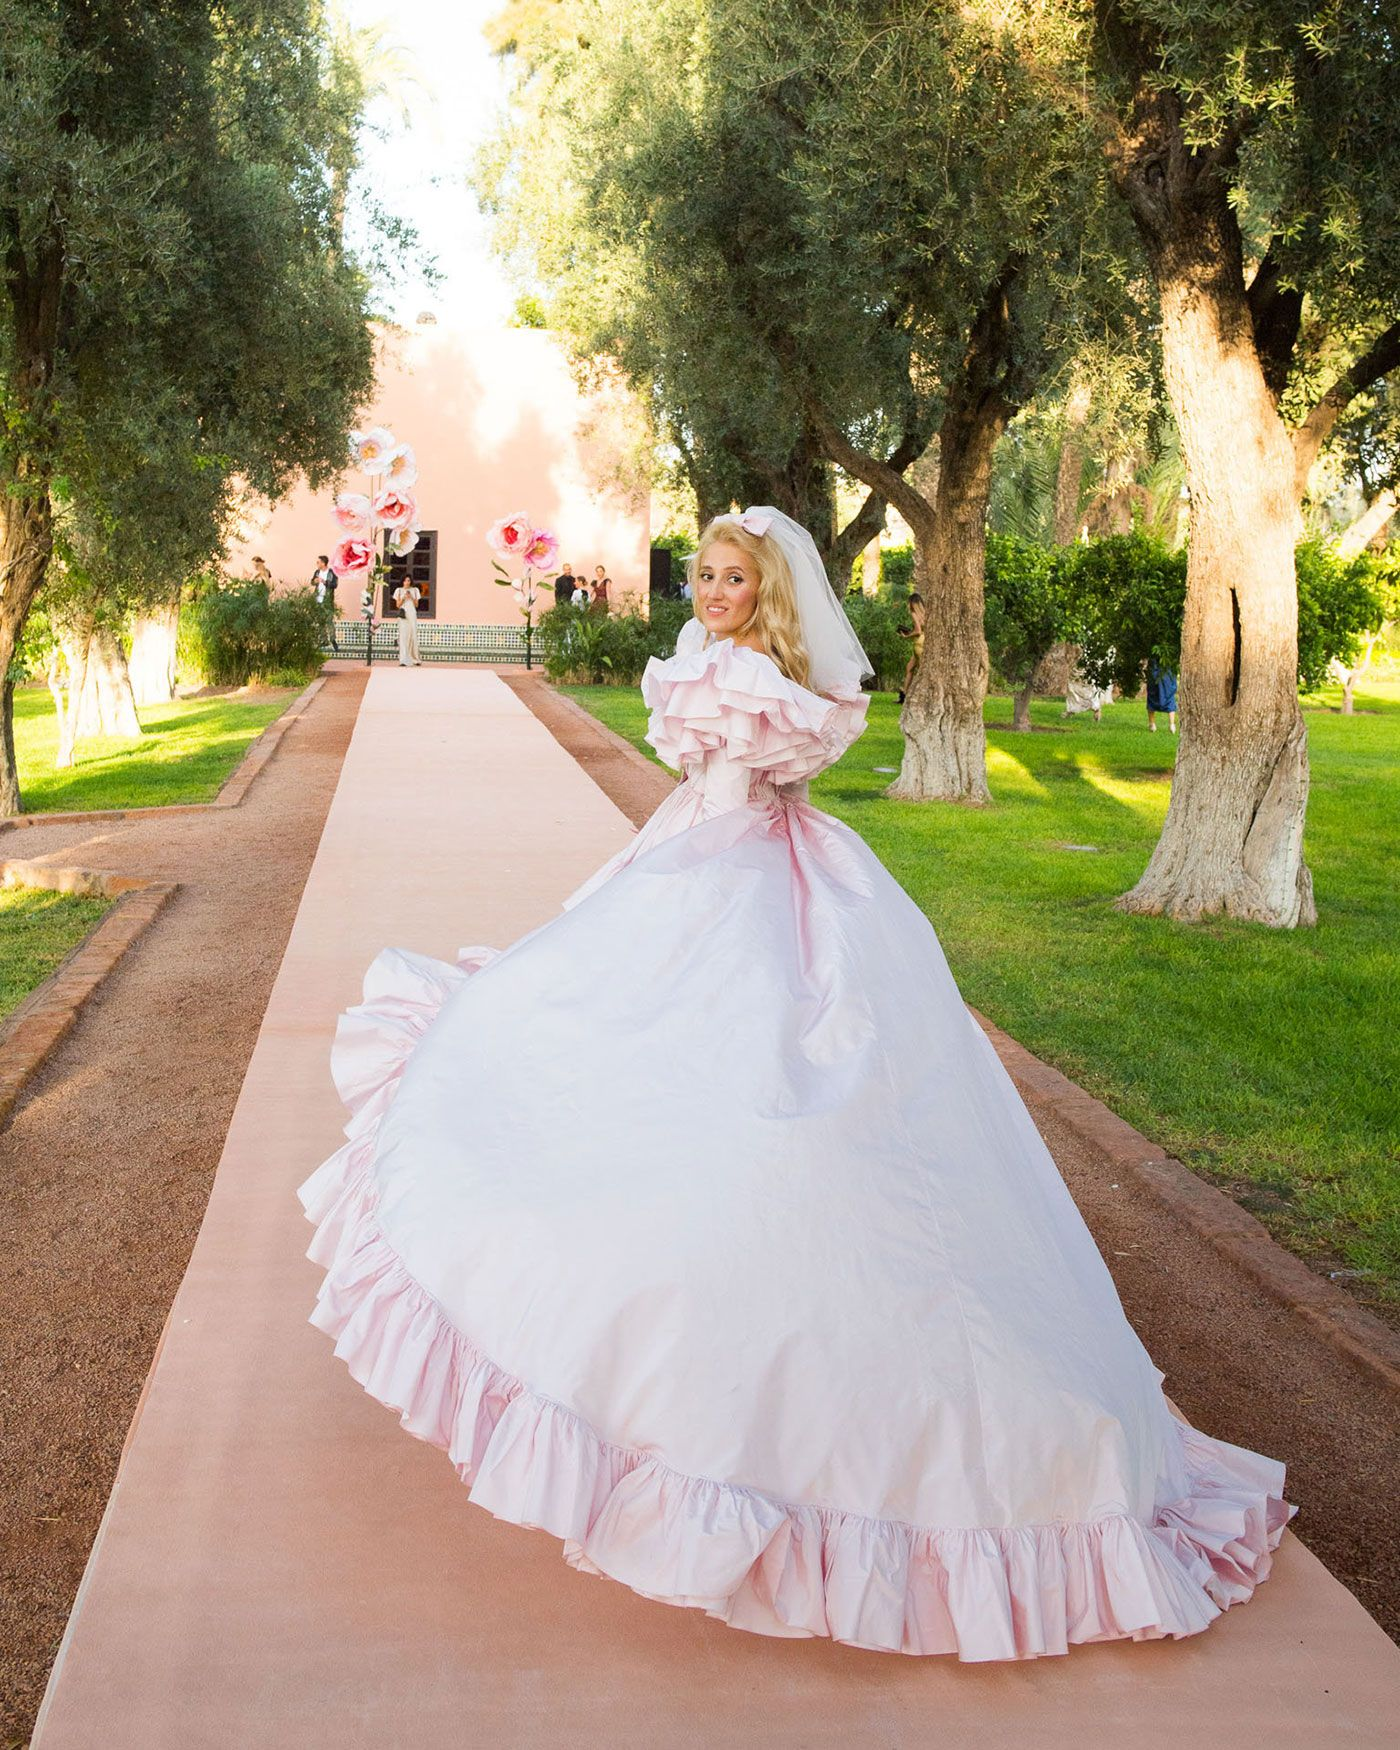 Vasilisa Michael Ruffle Wedding Dress Wedding Dresses Blush